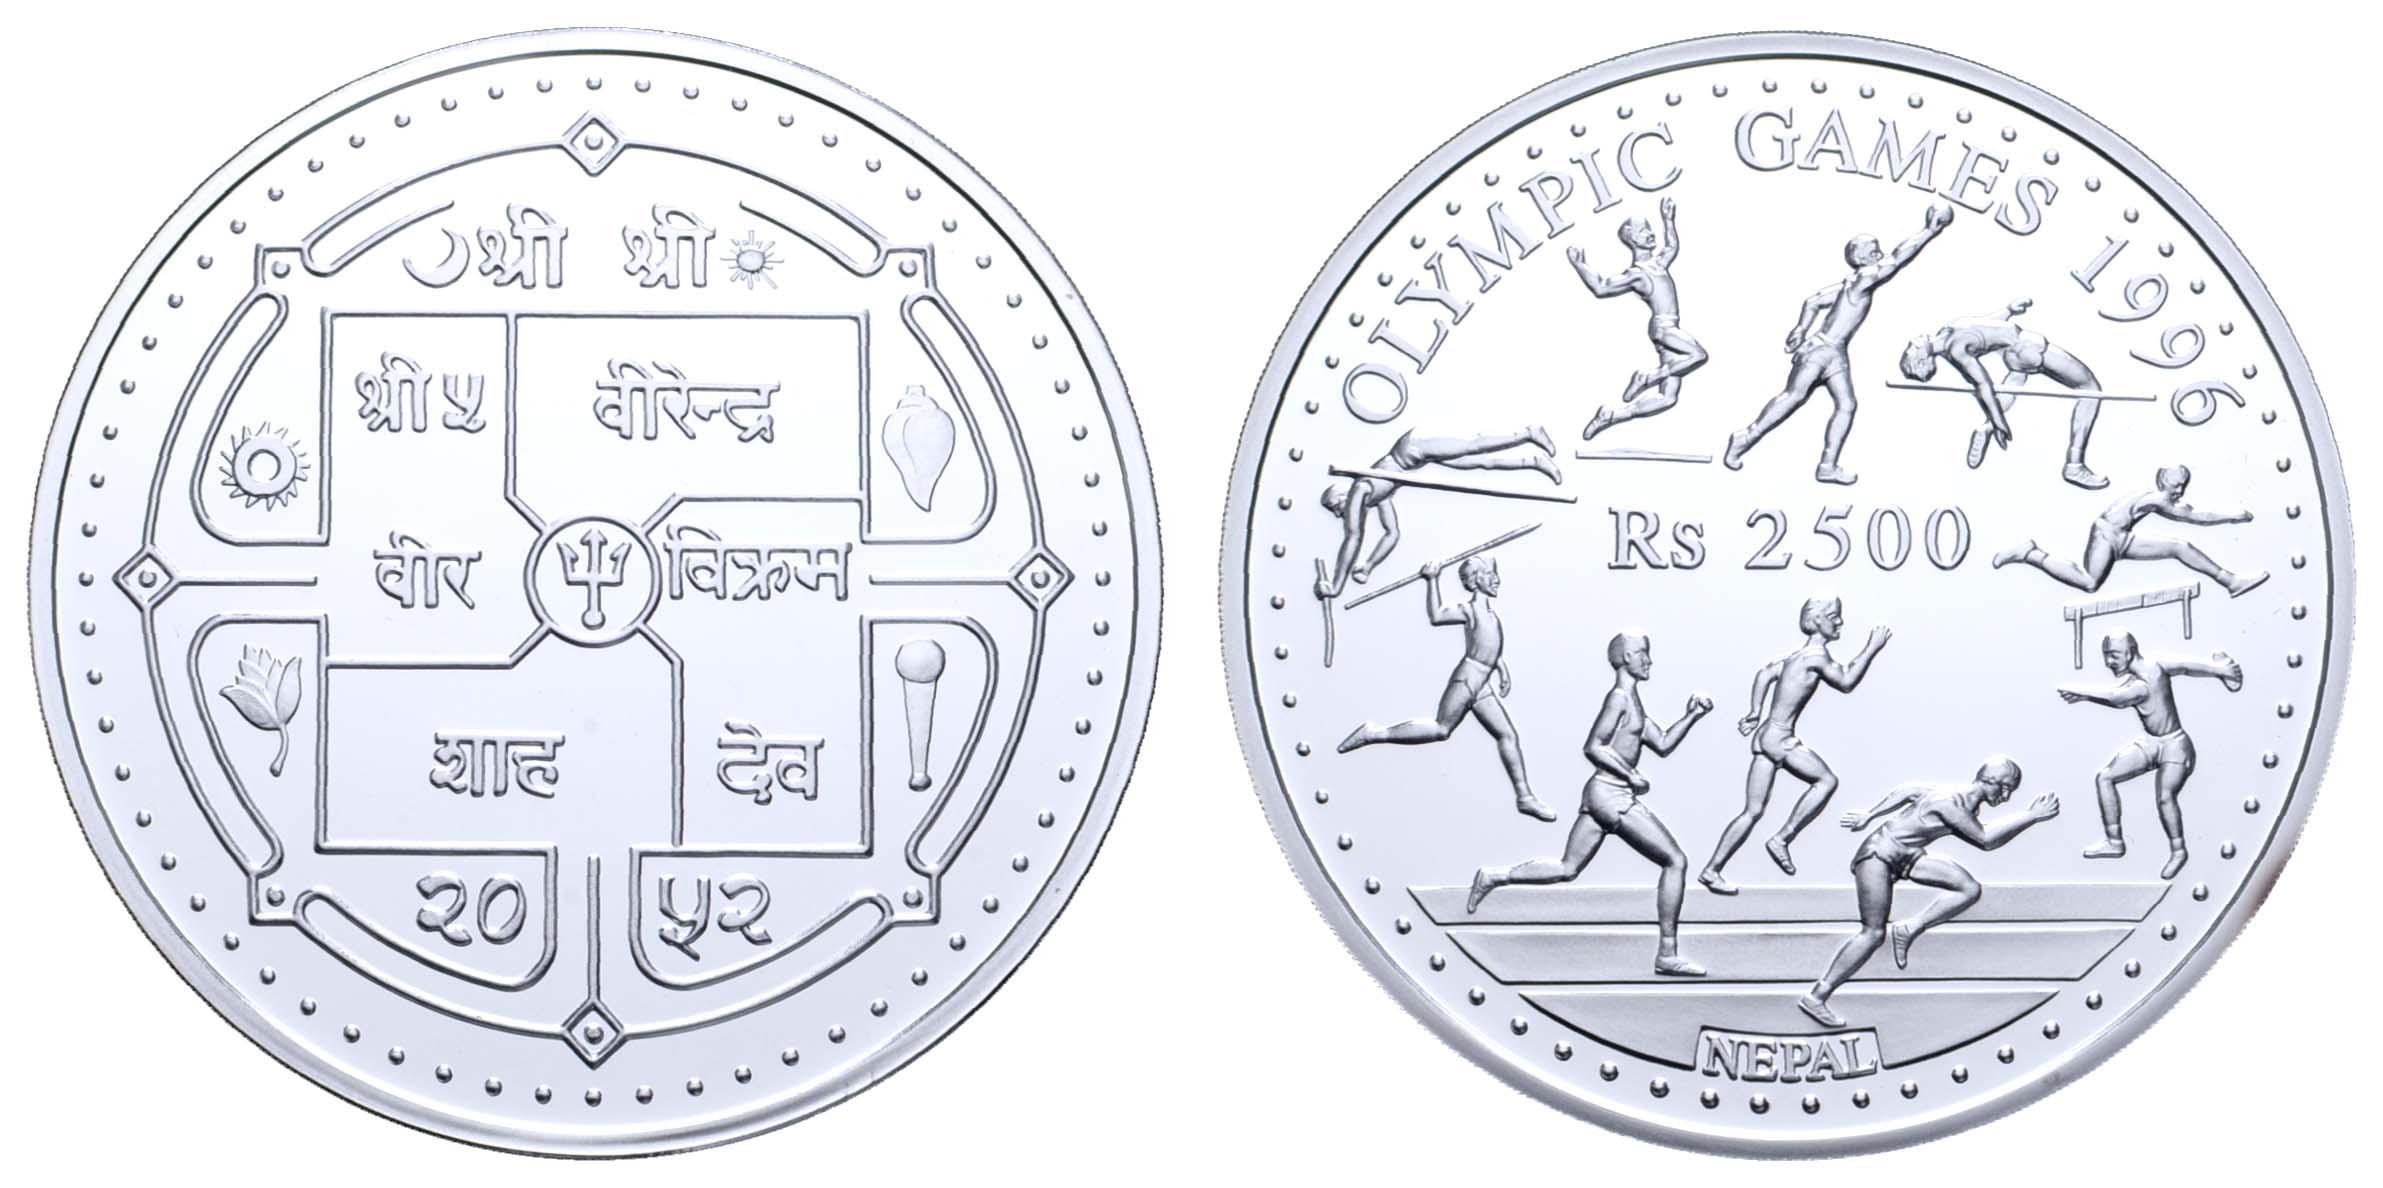 Lot 2076 - übersee Nepal -  Auktionshaus Ulrich Felzmann GmbH & Co. KG Coins single lots